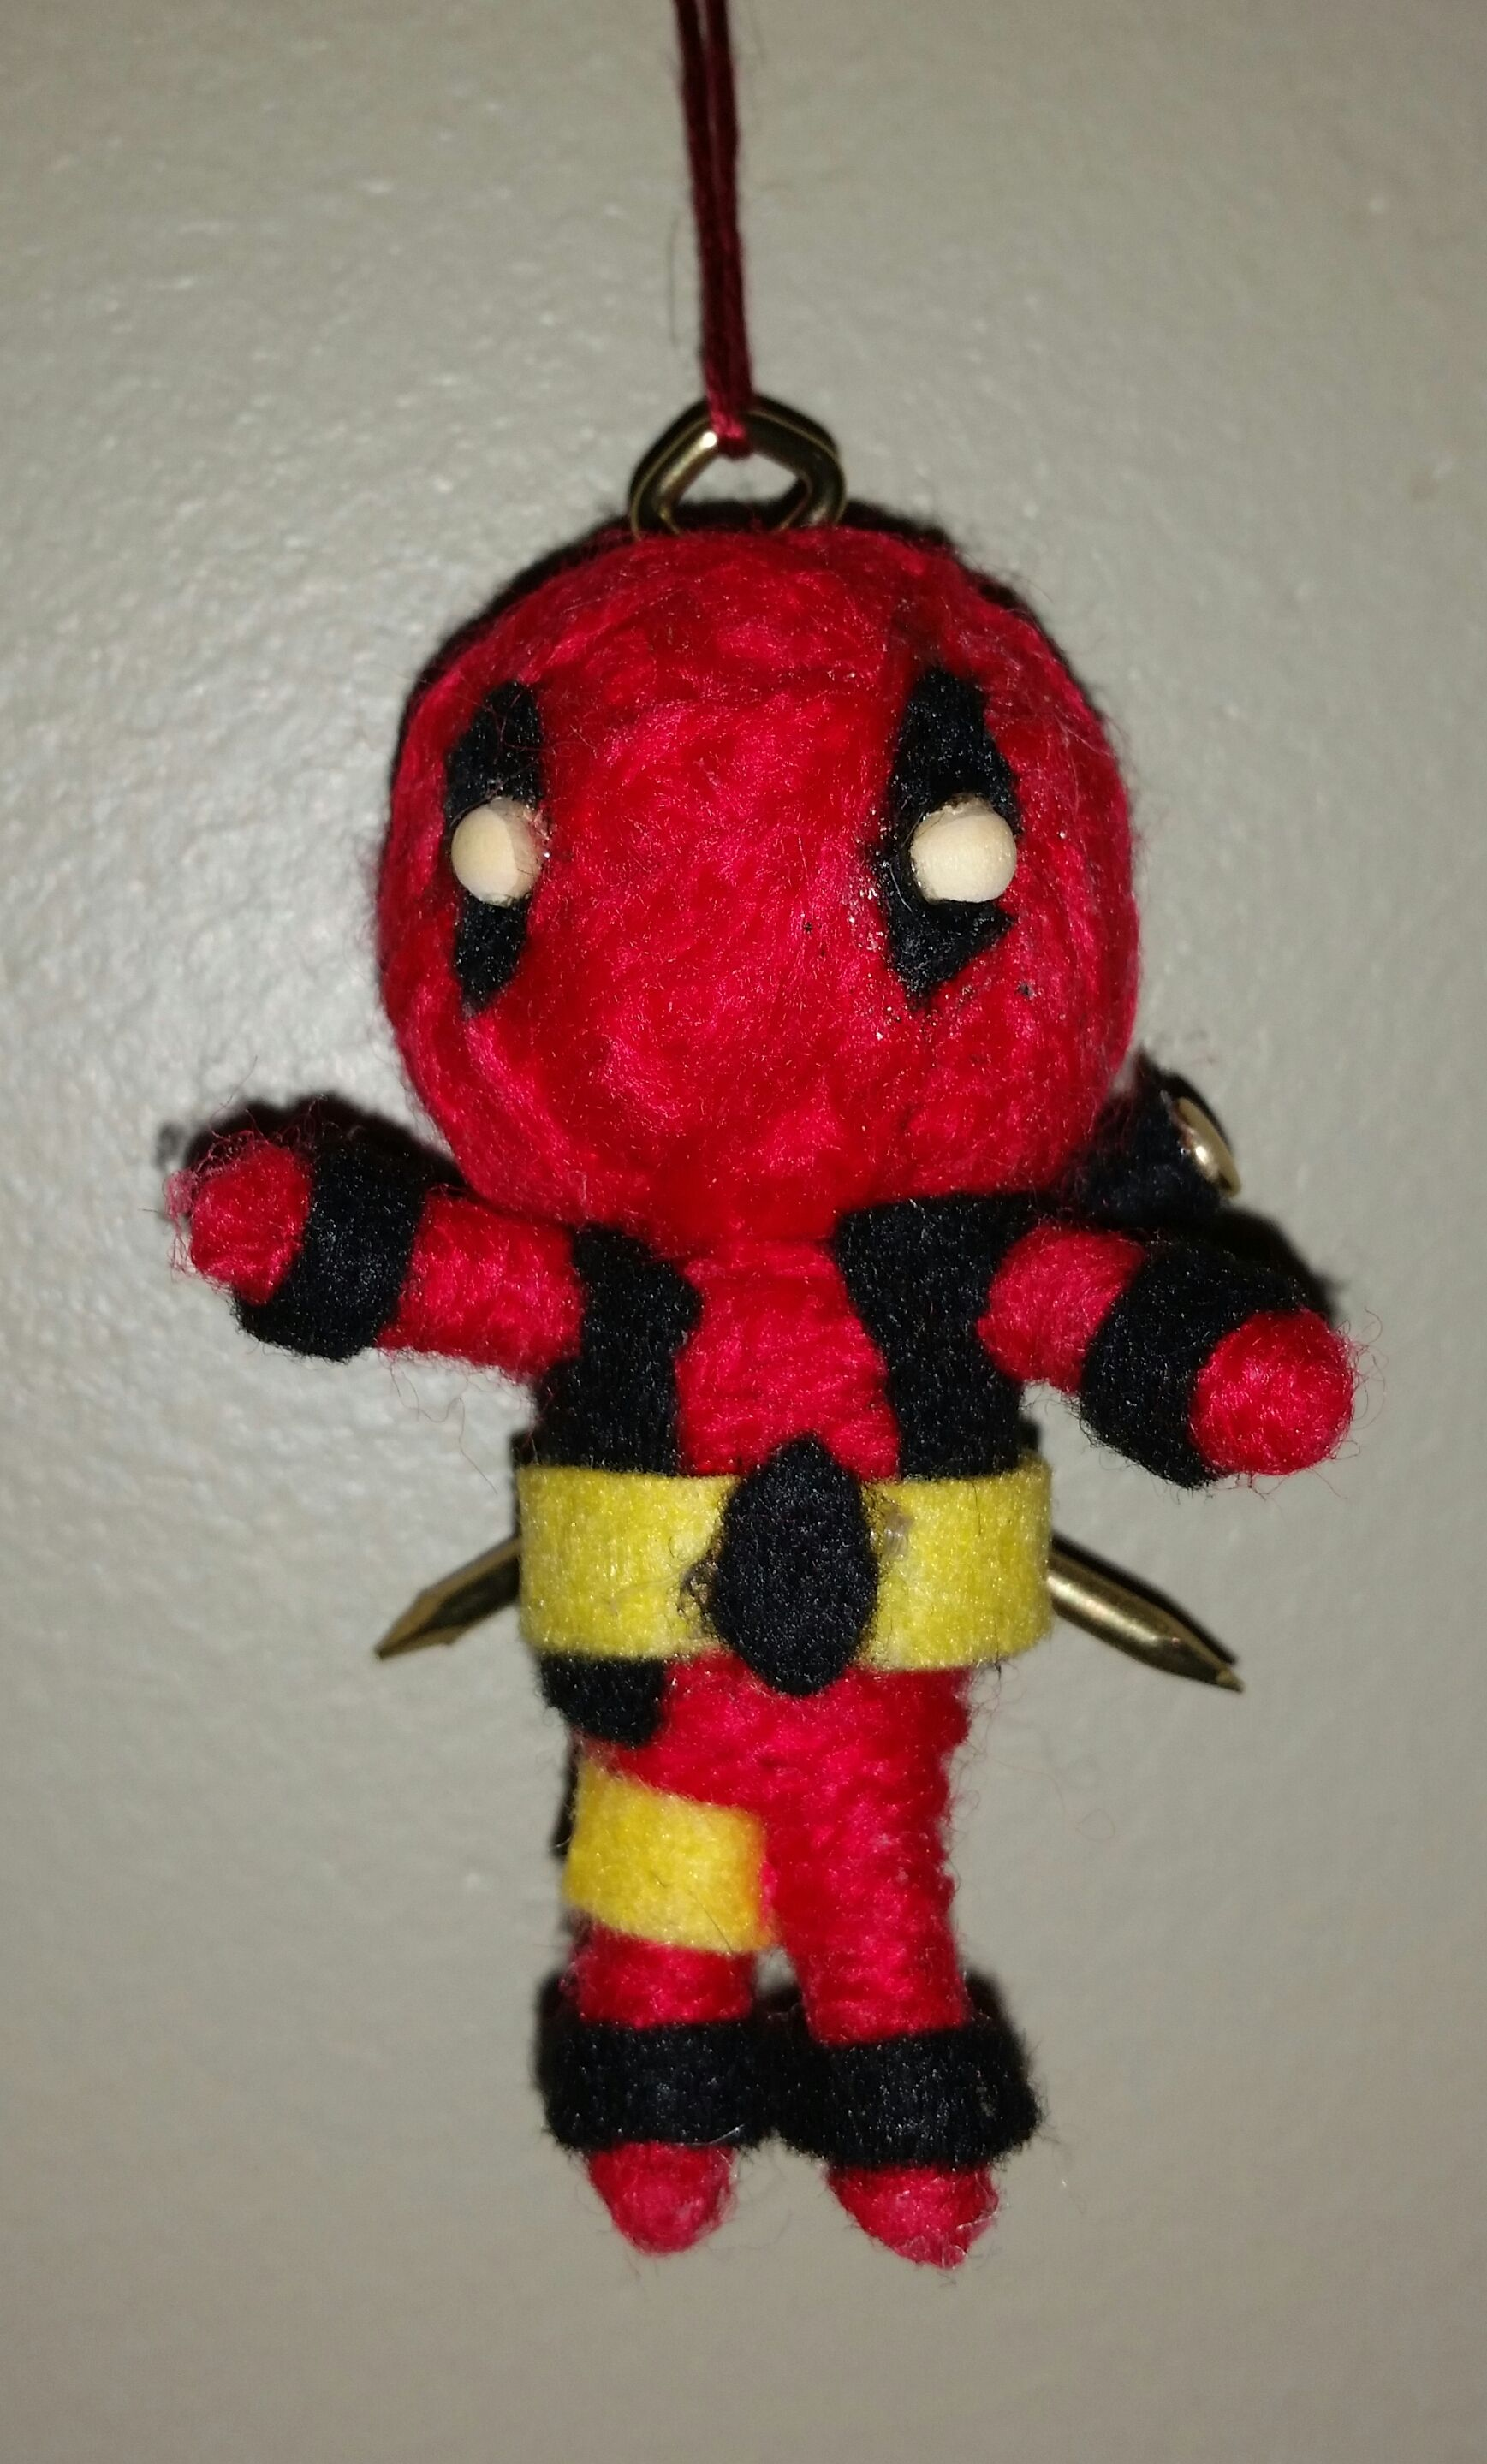 Deadpool voodoo string dolls pinterest deadpool voodoo and dolls